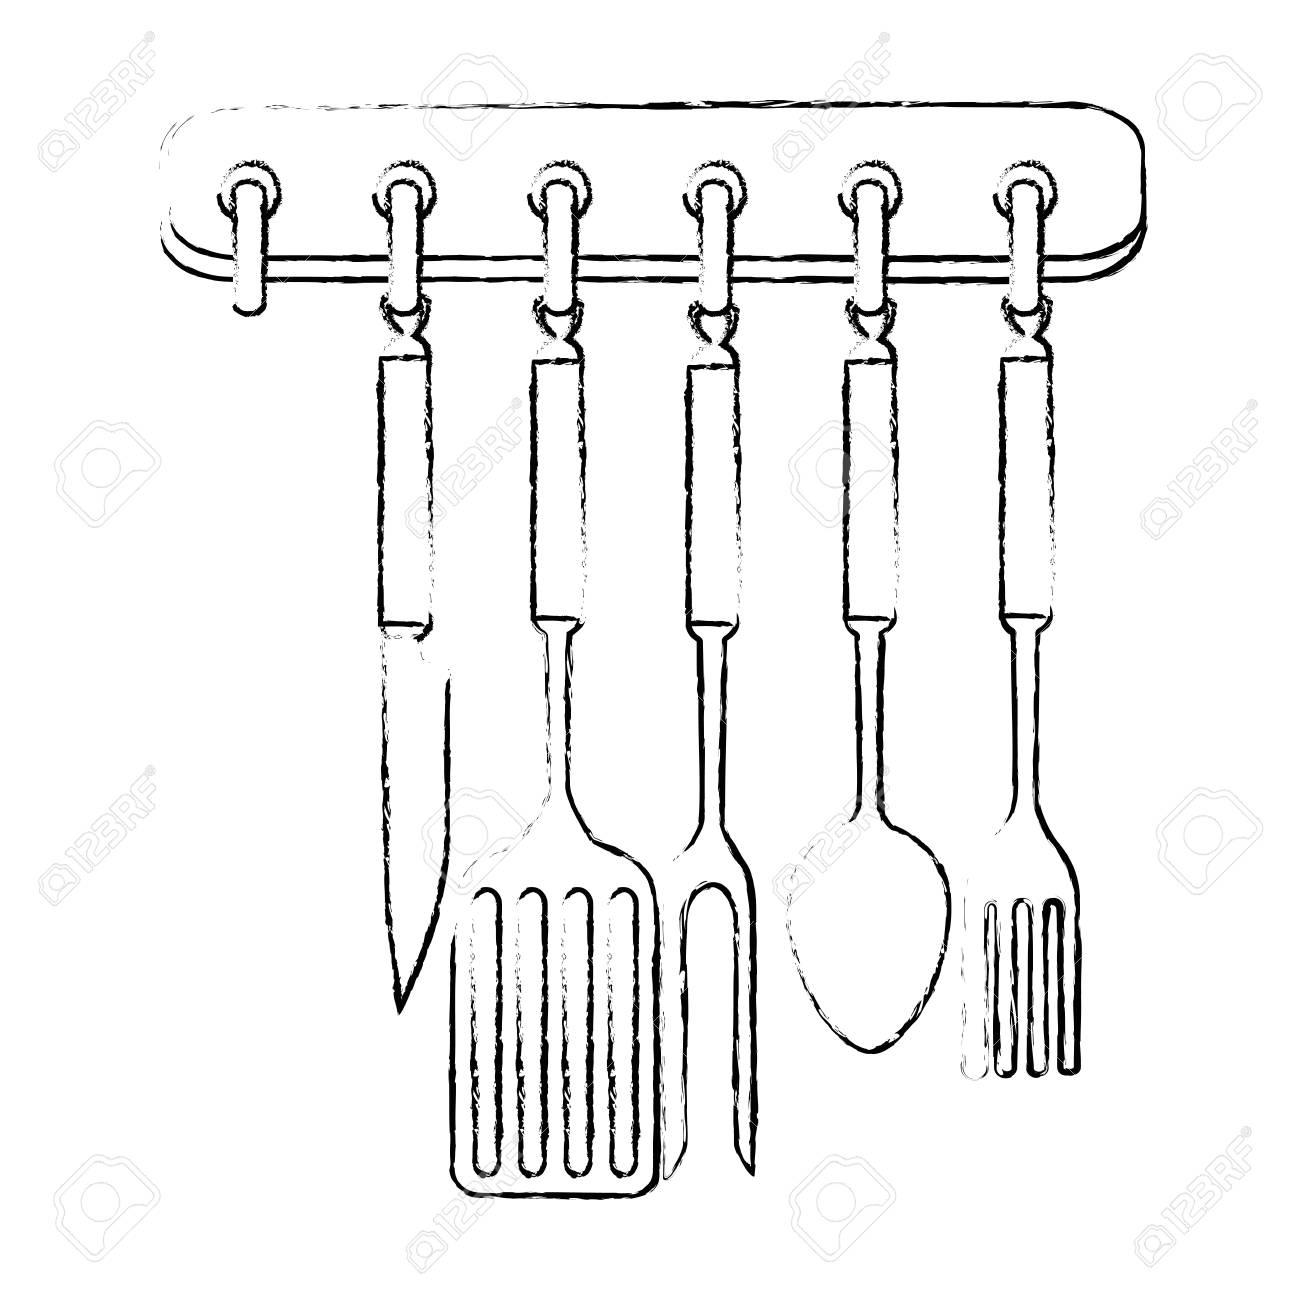 Kitchen set equipment hanging vector illustration design stock vector 85560286